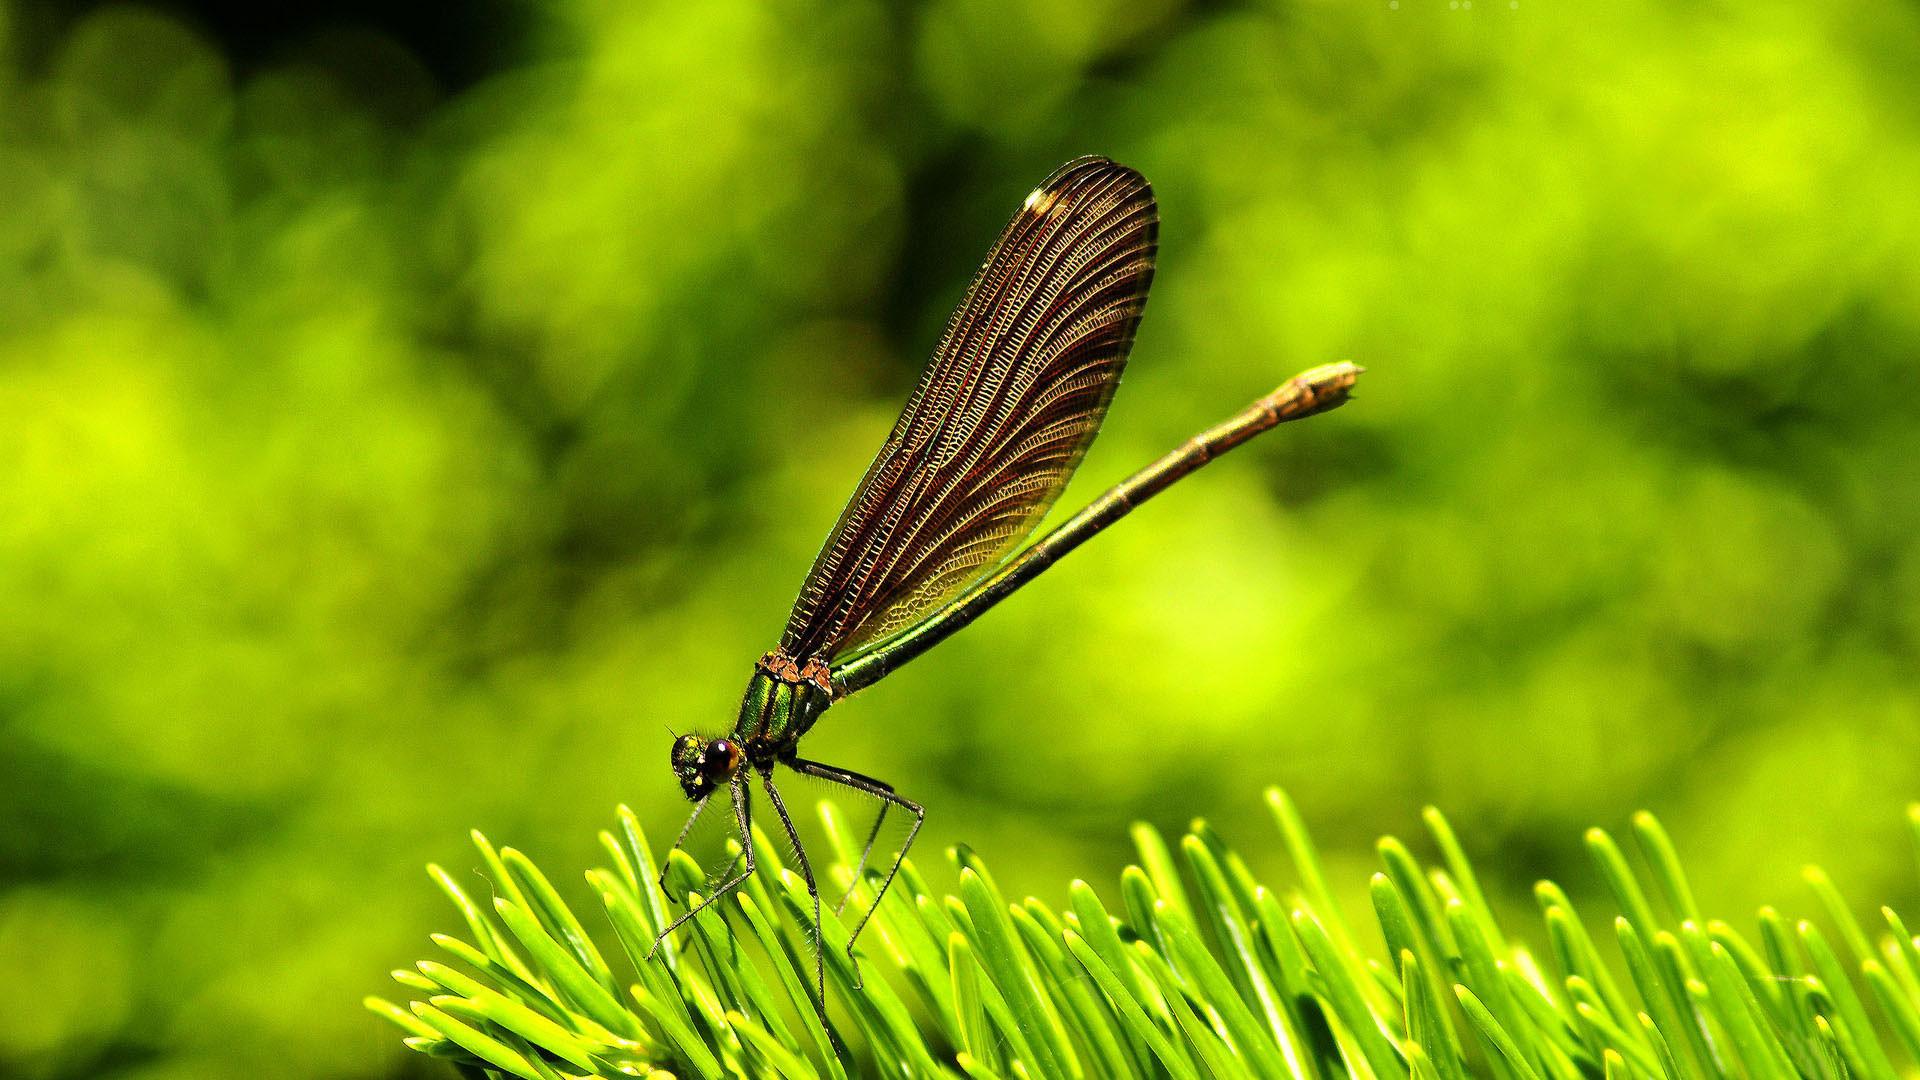 hd pics photos best beautiful dragon fly macro nature hd quality desktop  background wallpaper